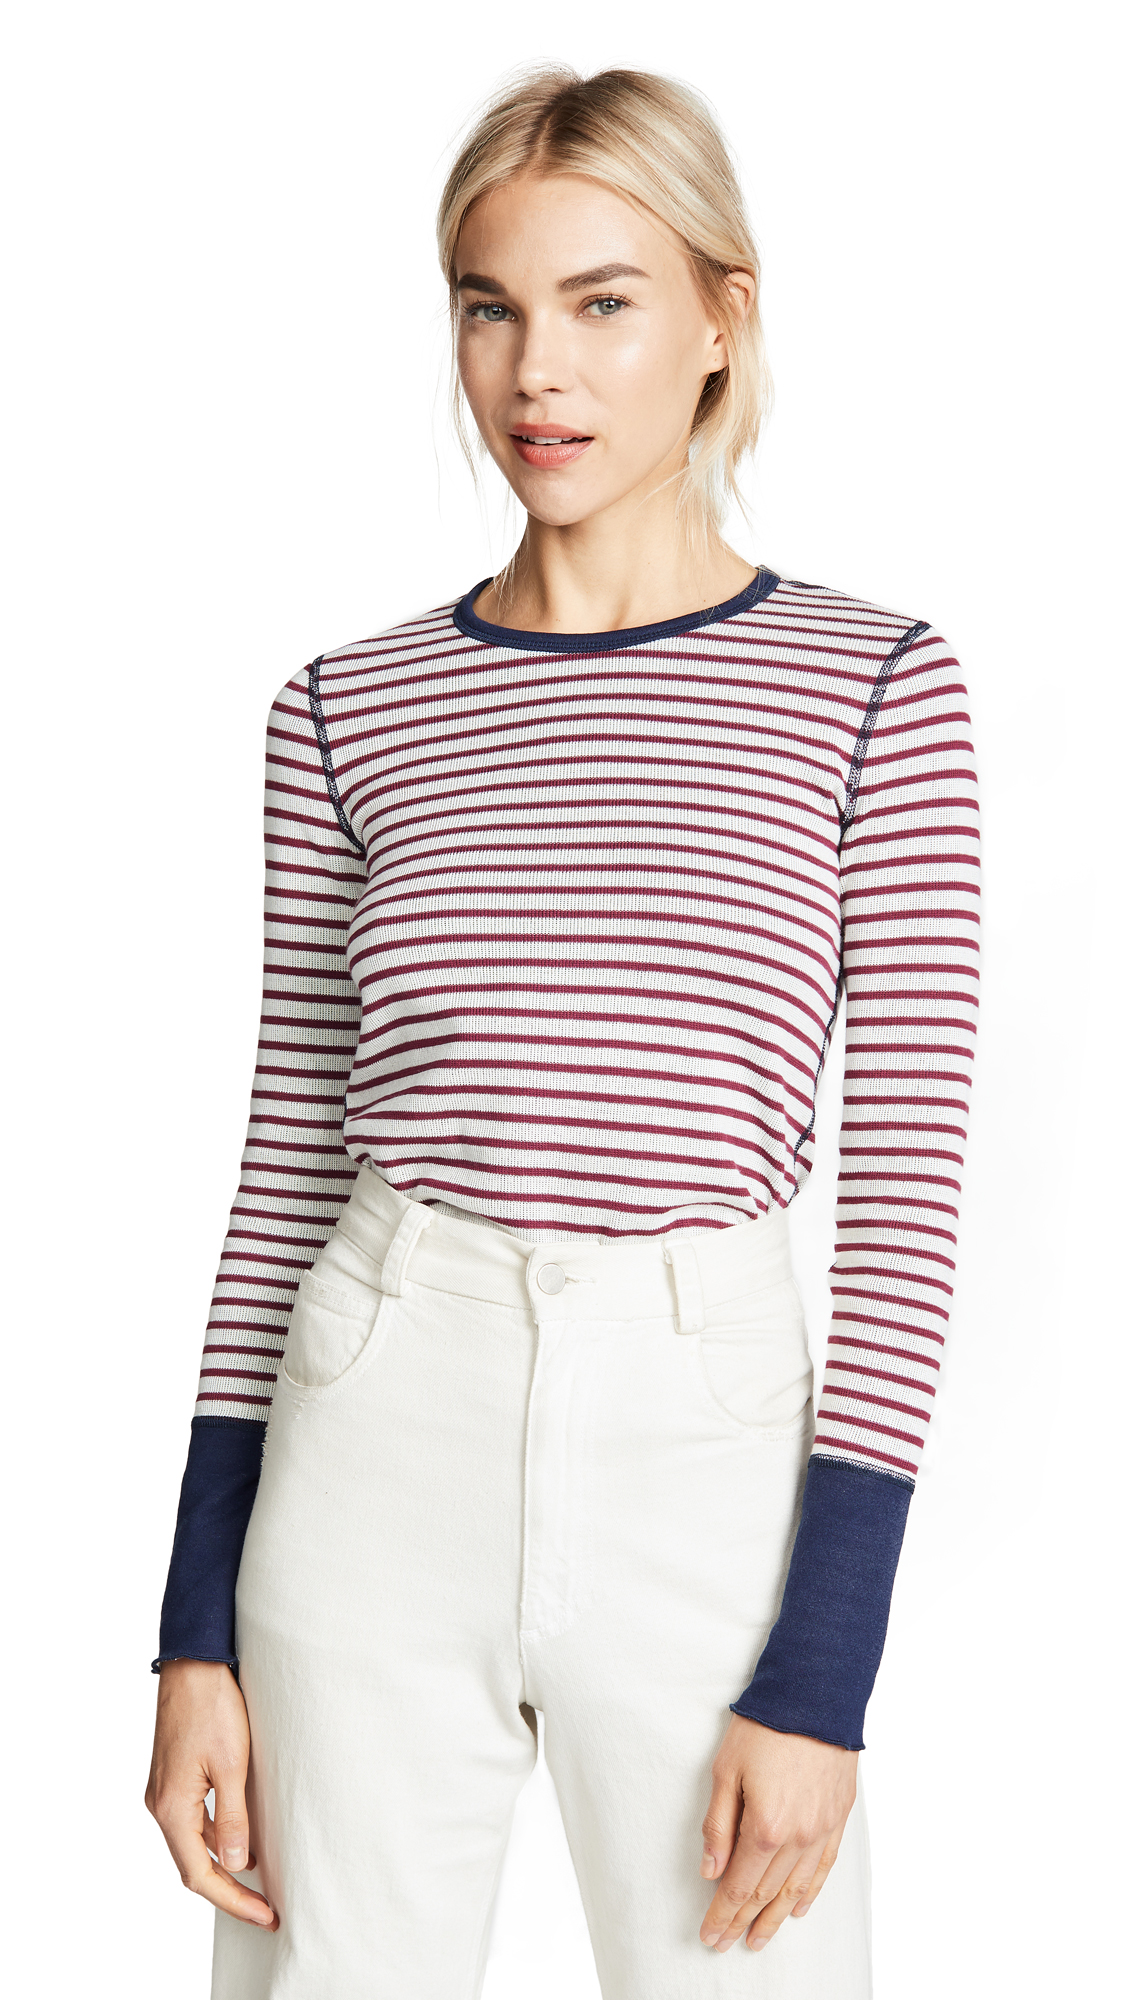 Three Dots Stripe Long Sleeve Top In Rubino/Naural